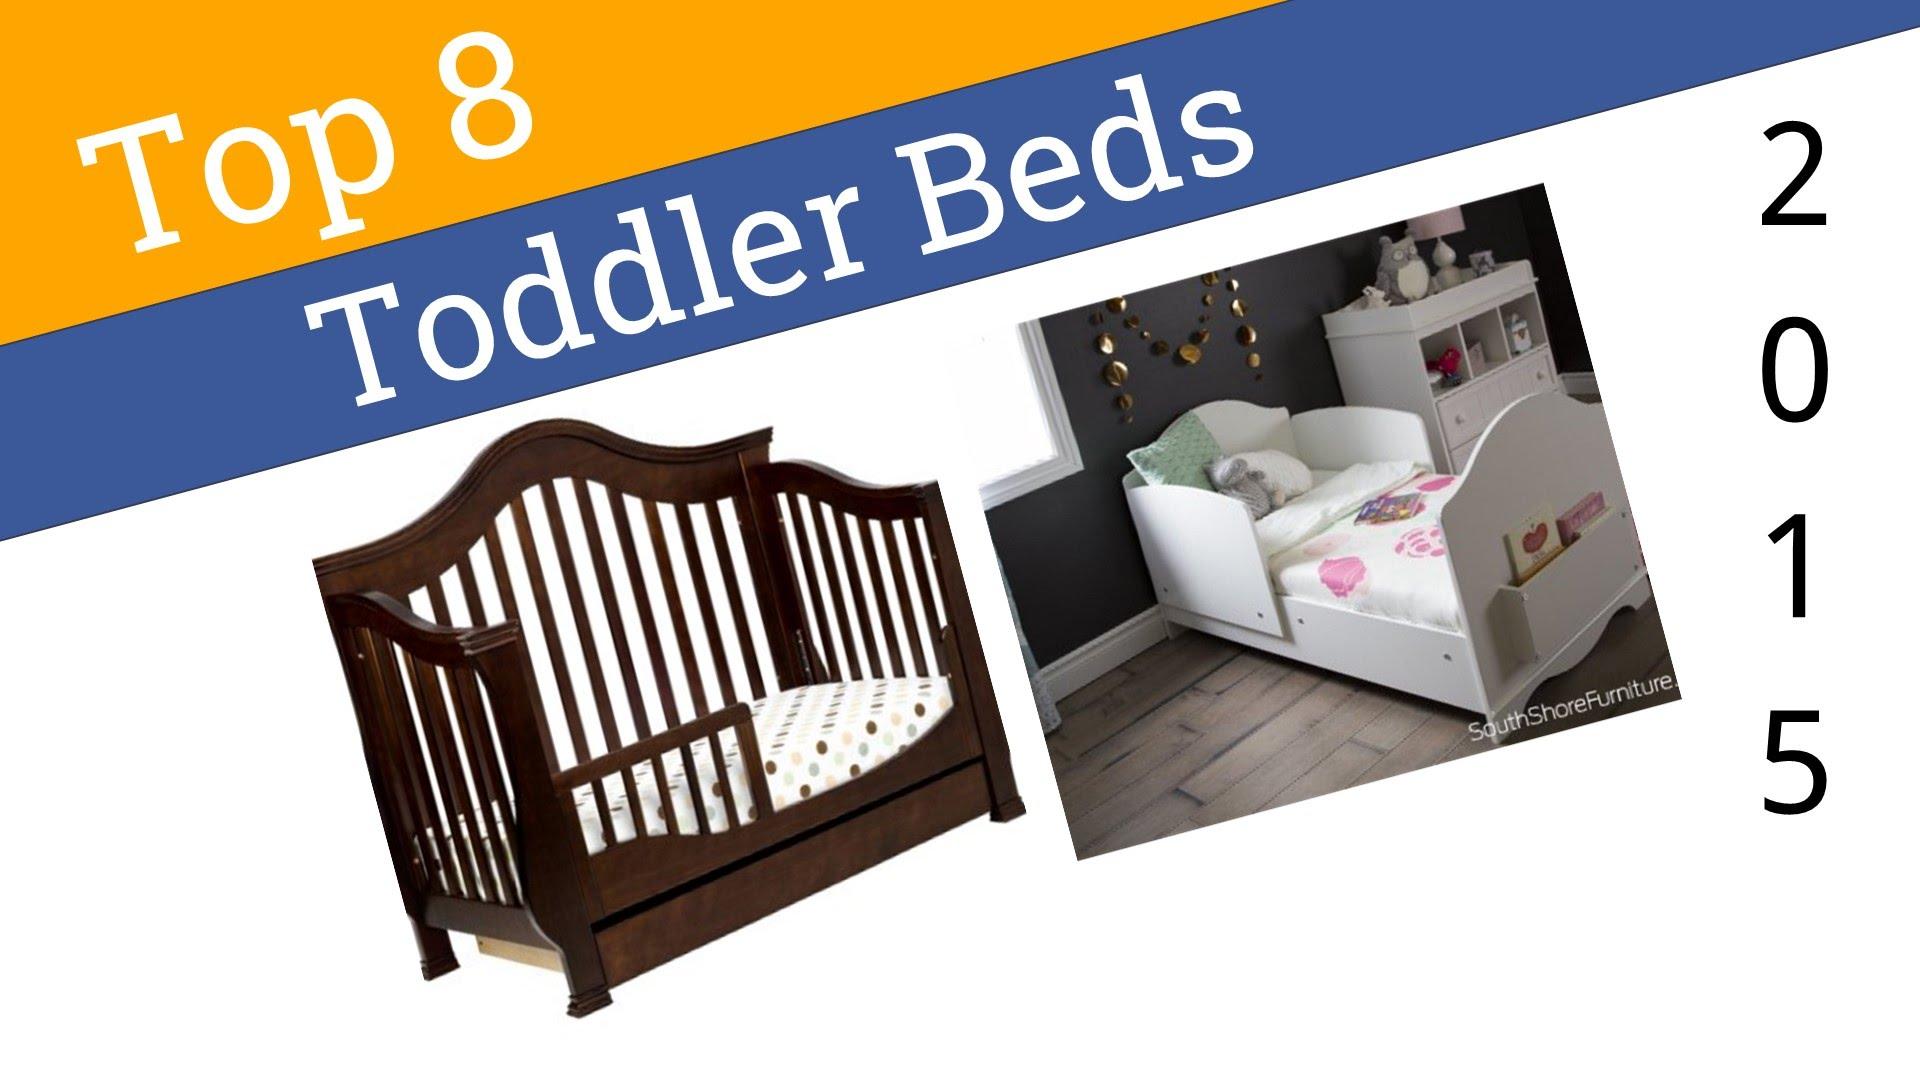 Best Toddler Beds 2015